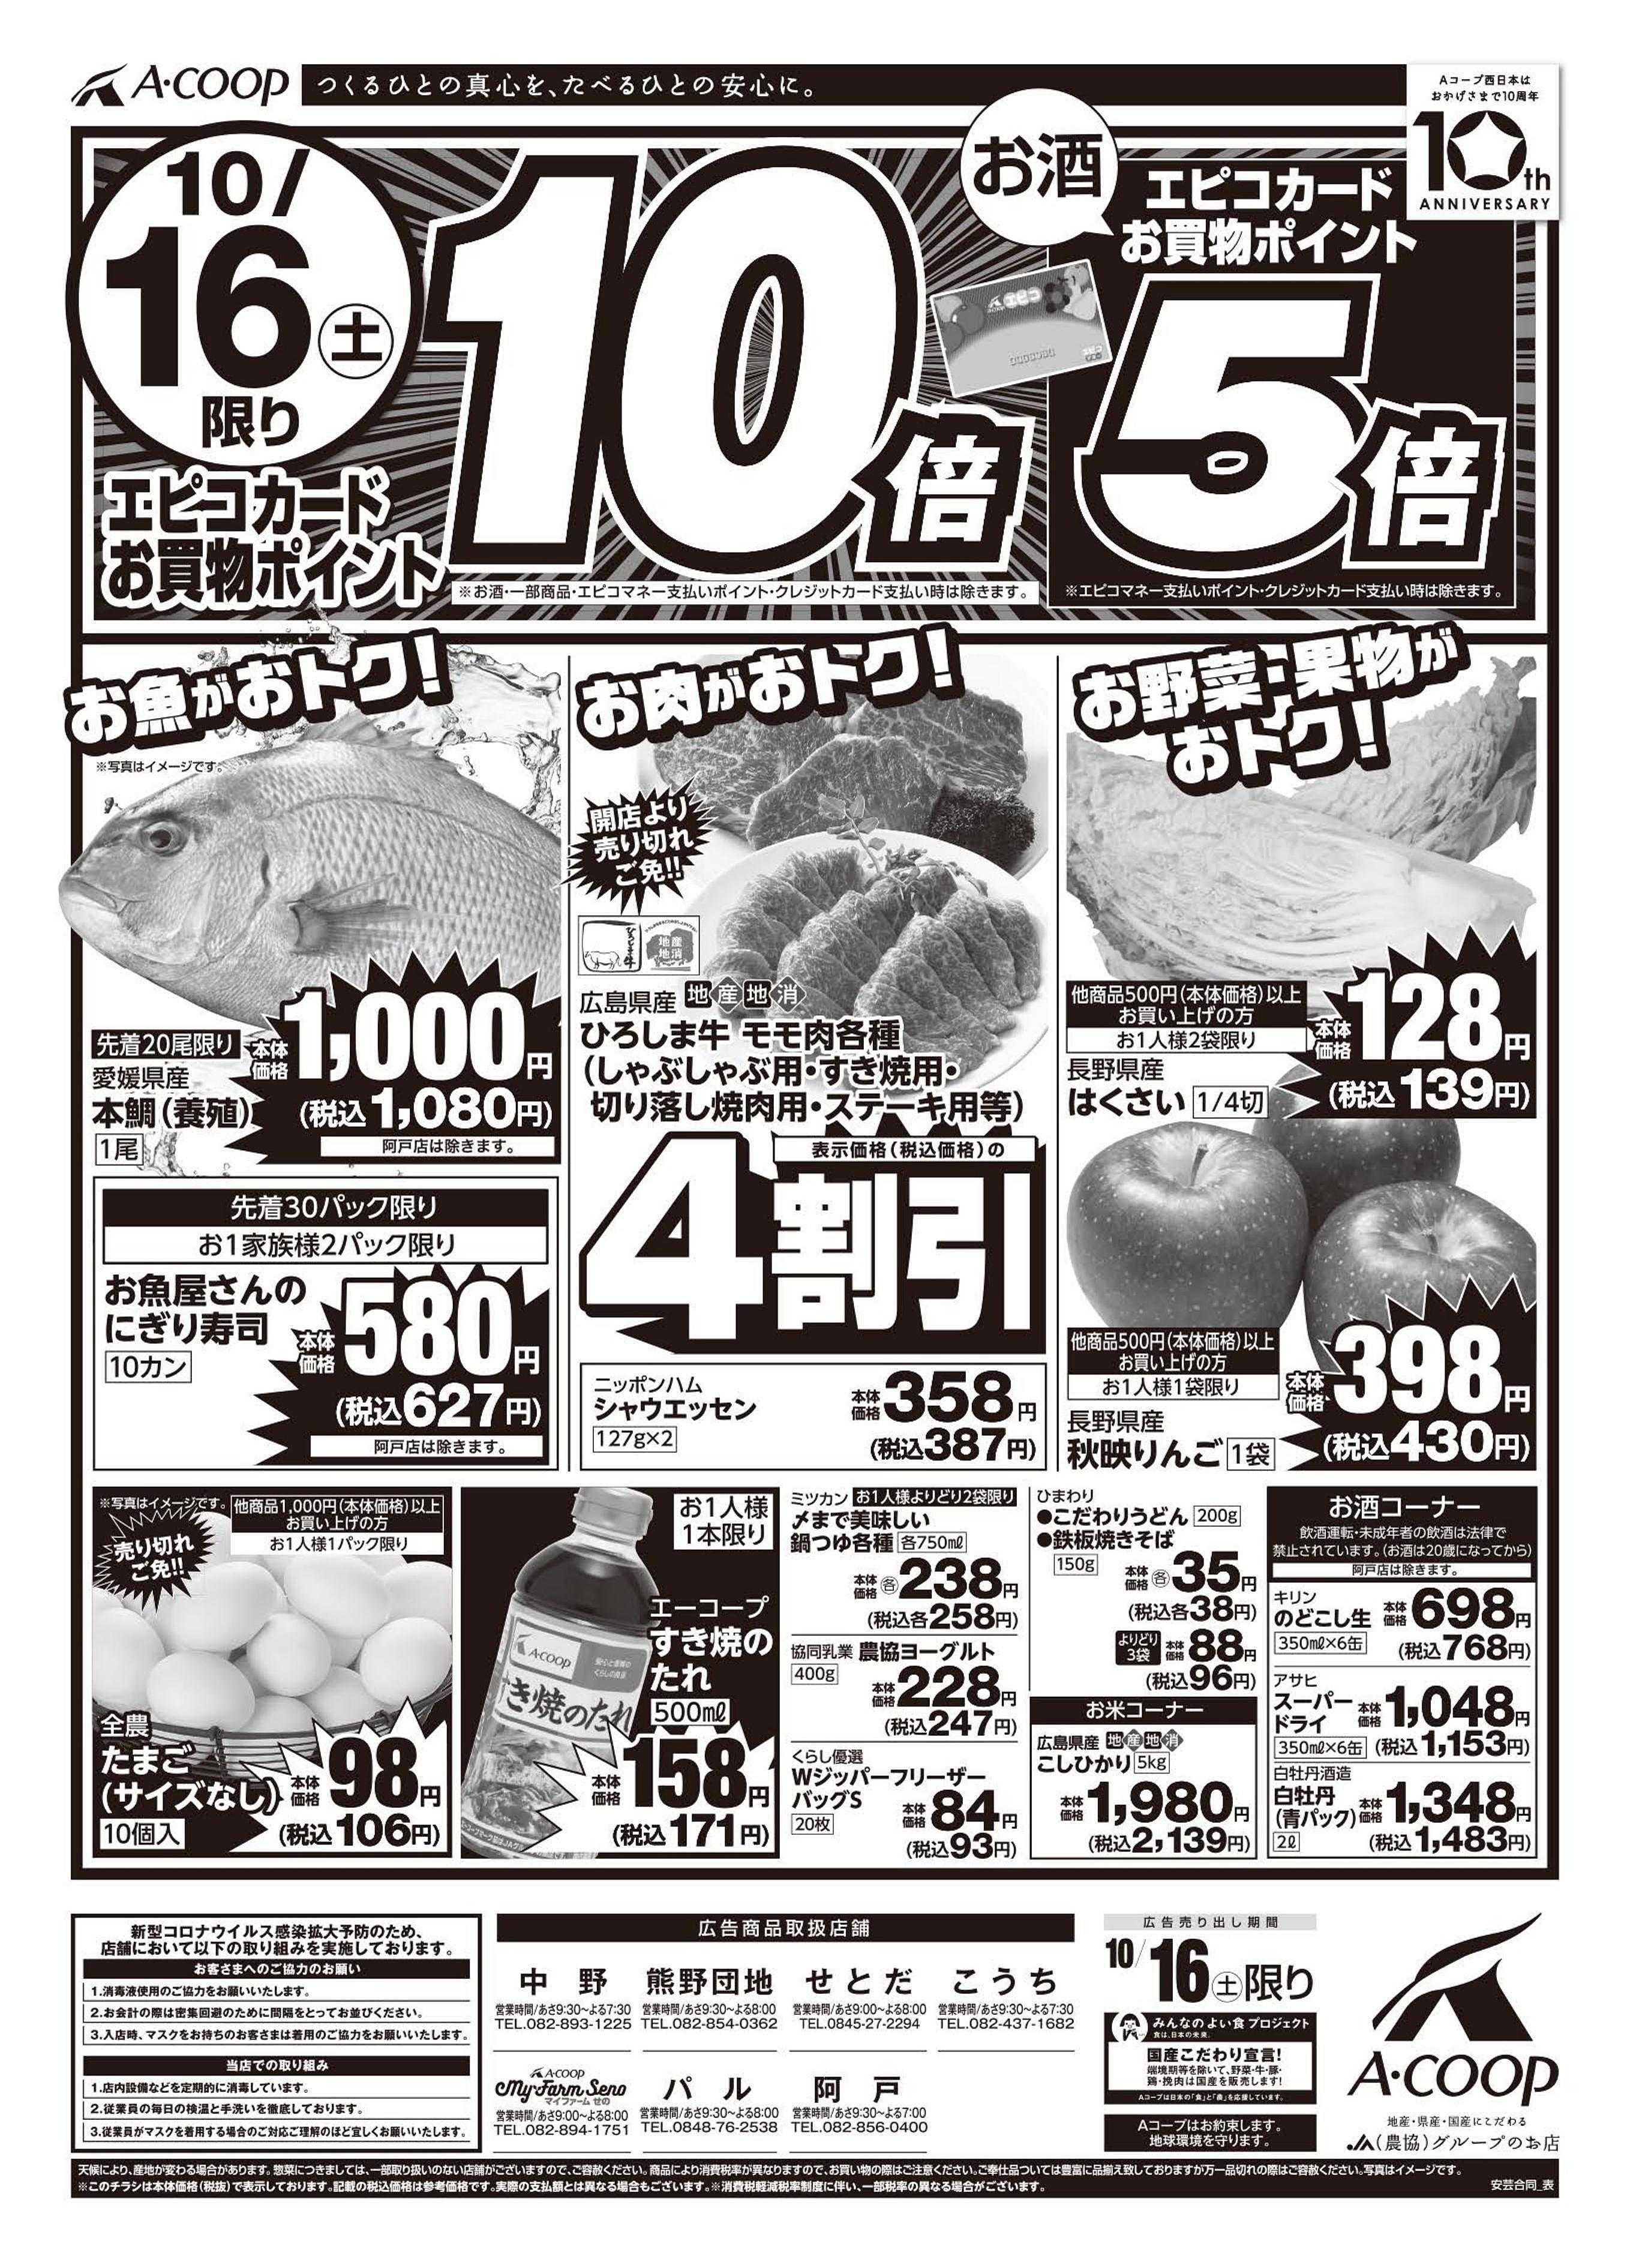 Aコープ西日本 10/16(土)限り